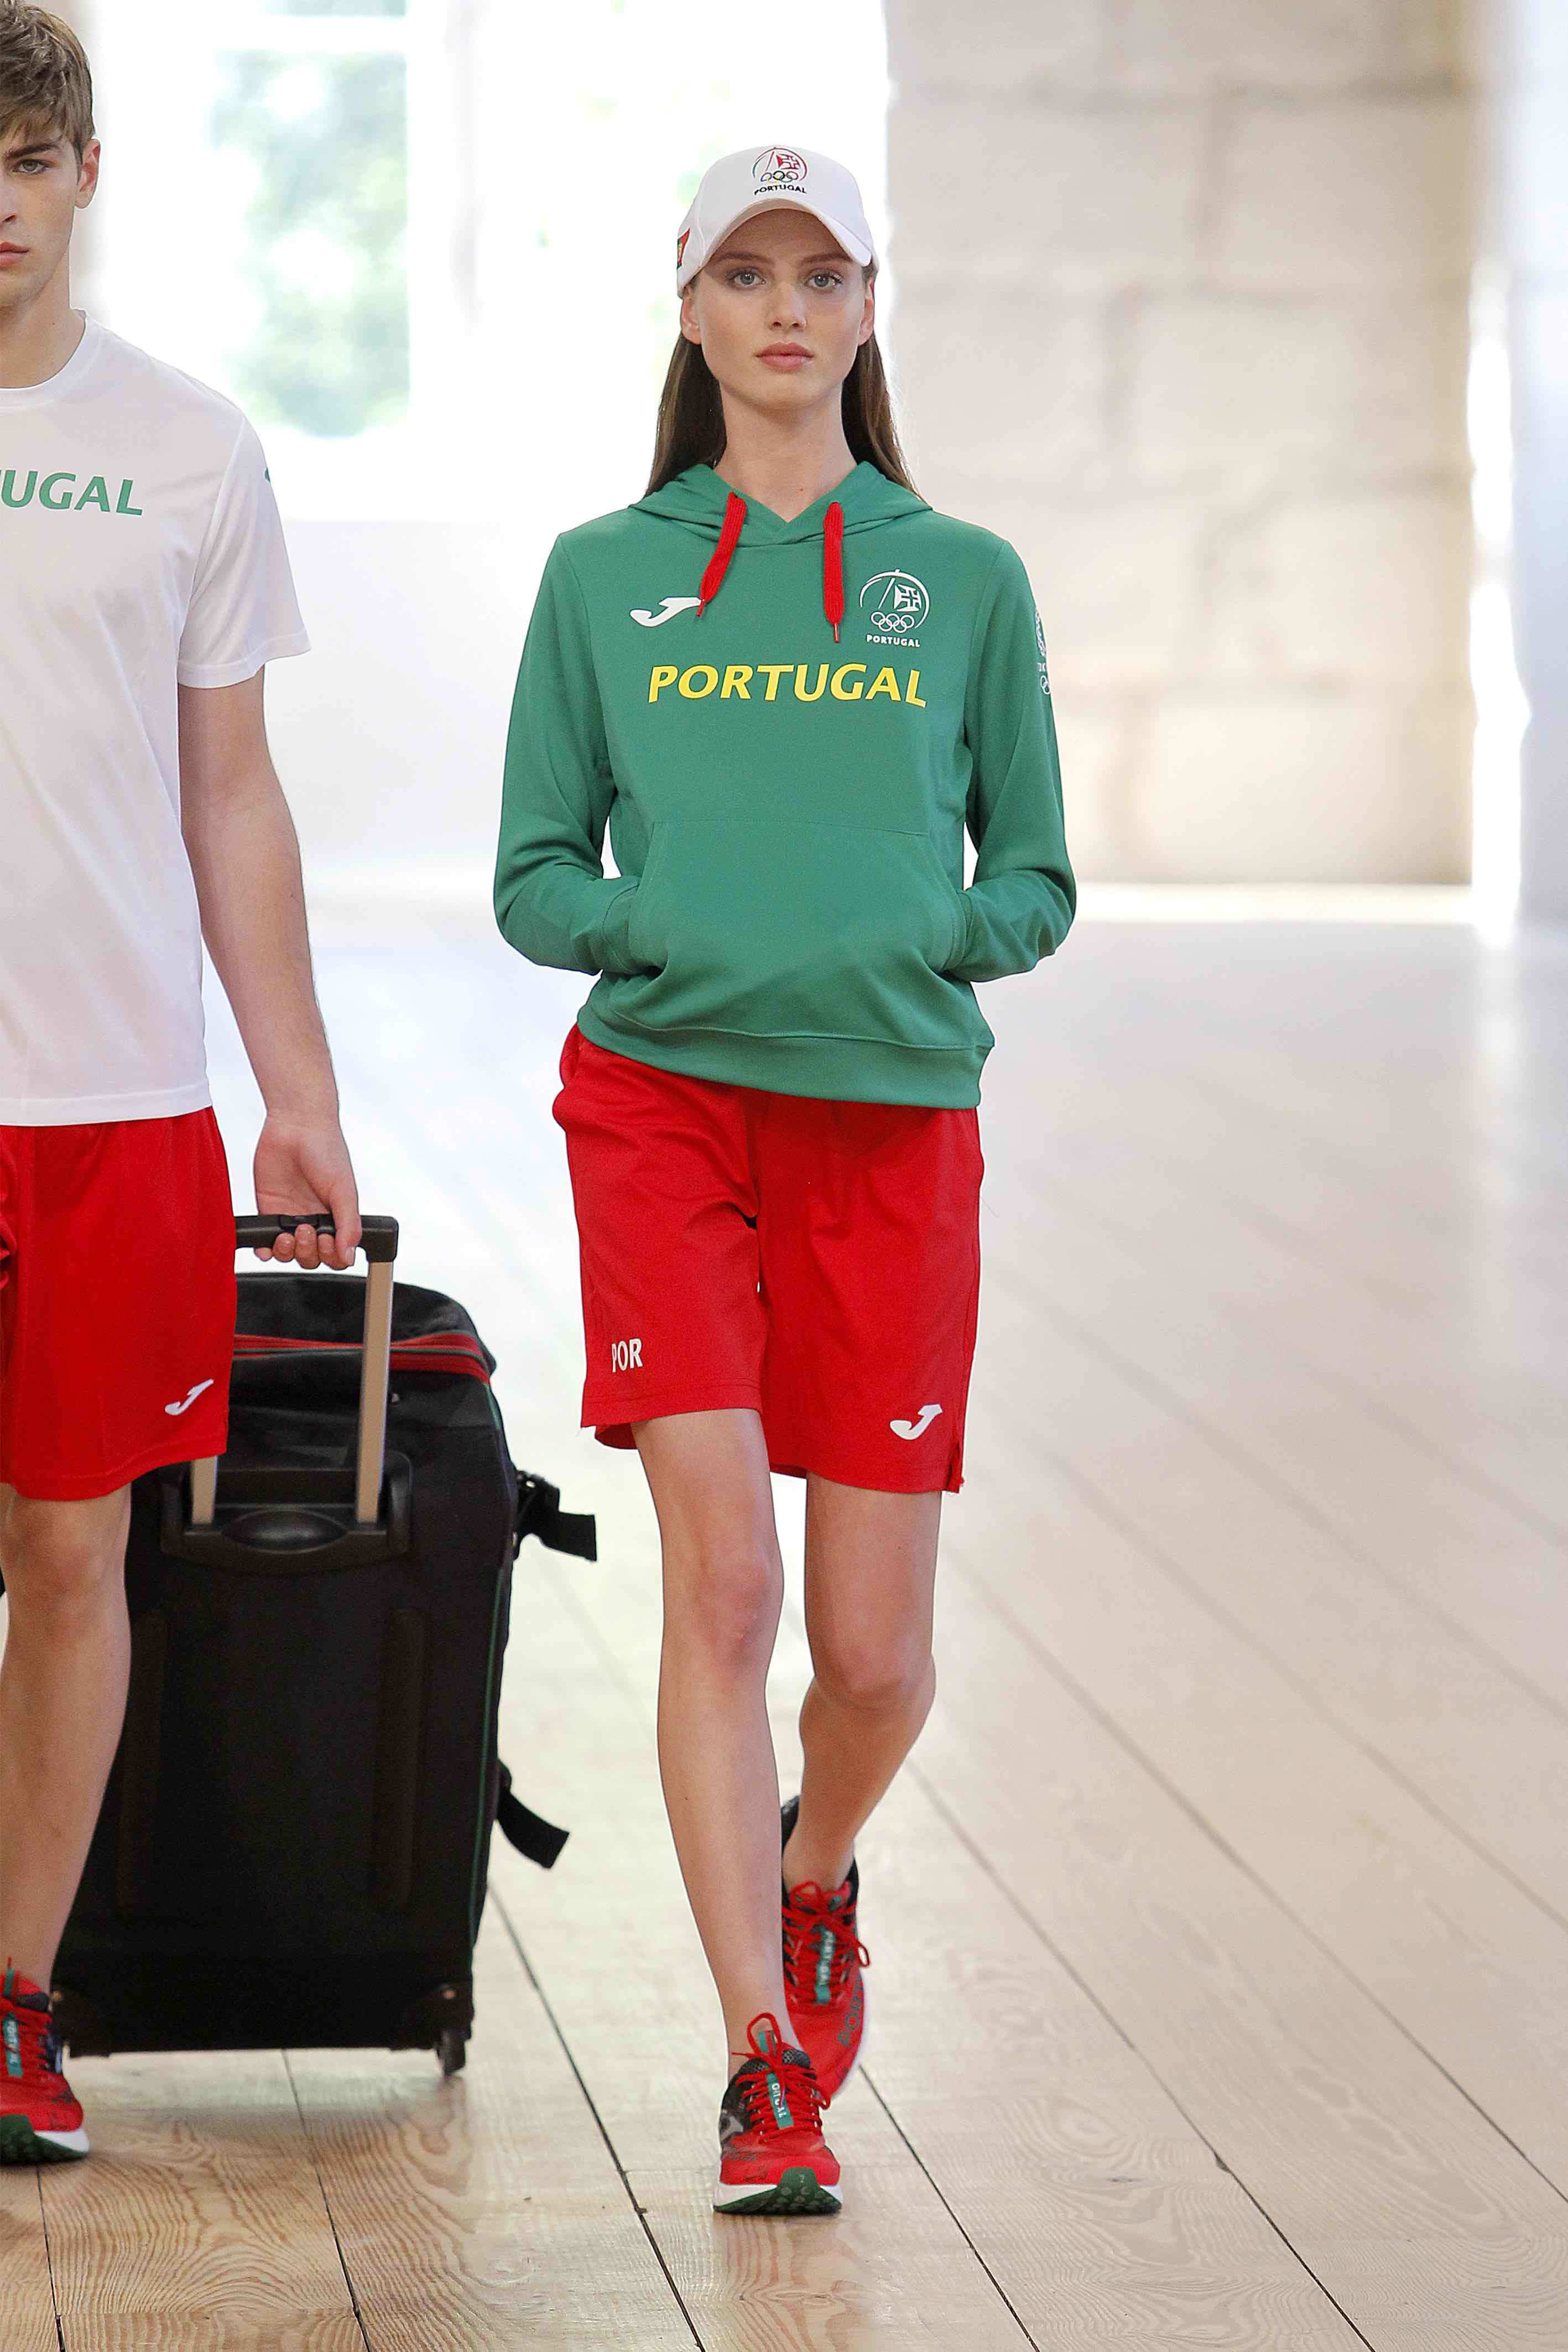 Portugal Fashion #SofaEdition 6